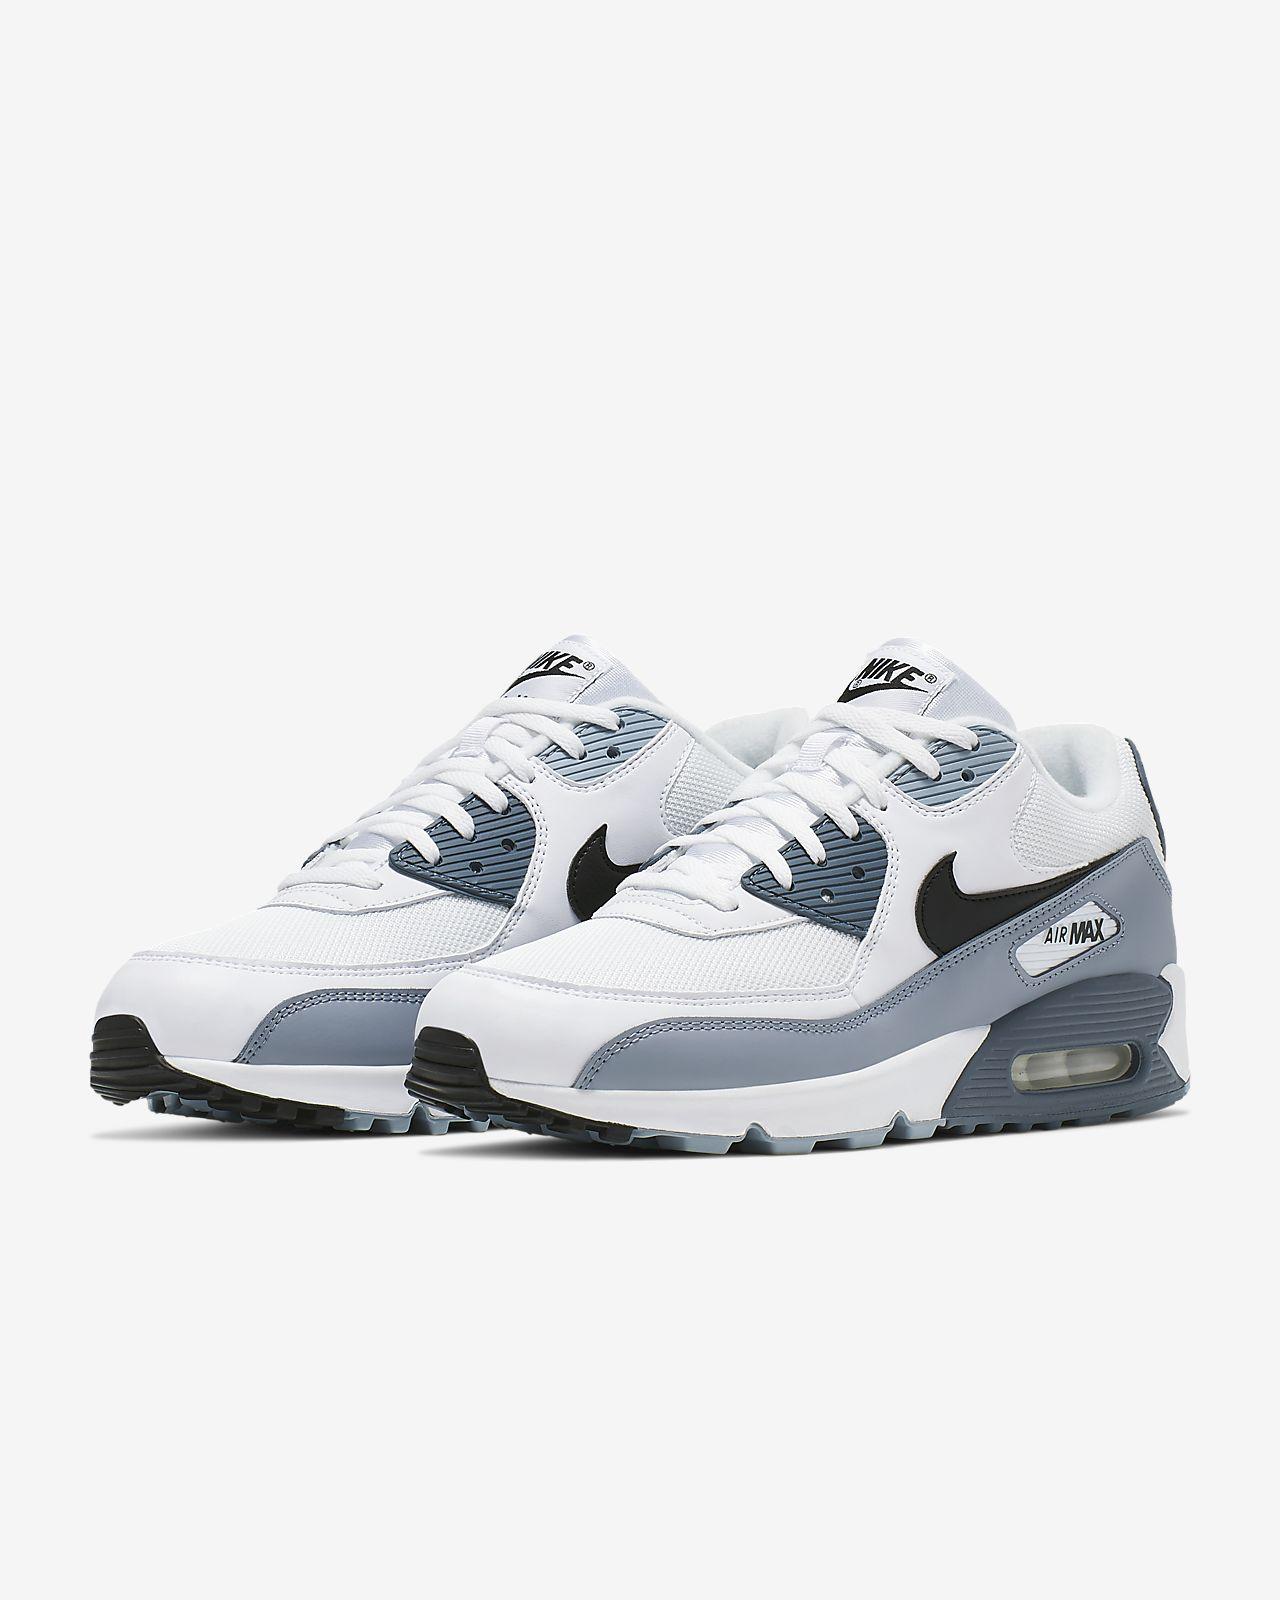 separation shoes 8b4f4 a23cc ... Nike Air Max 90 Essential Men s Shoe